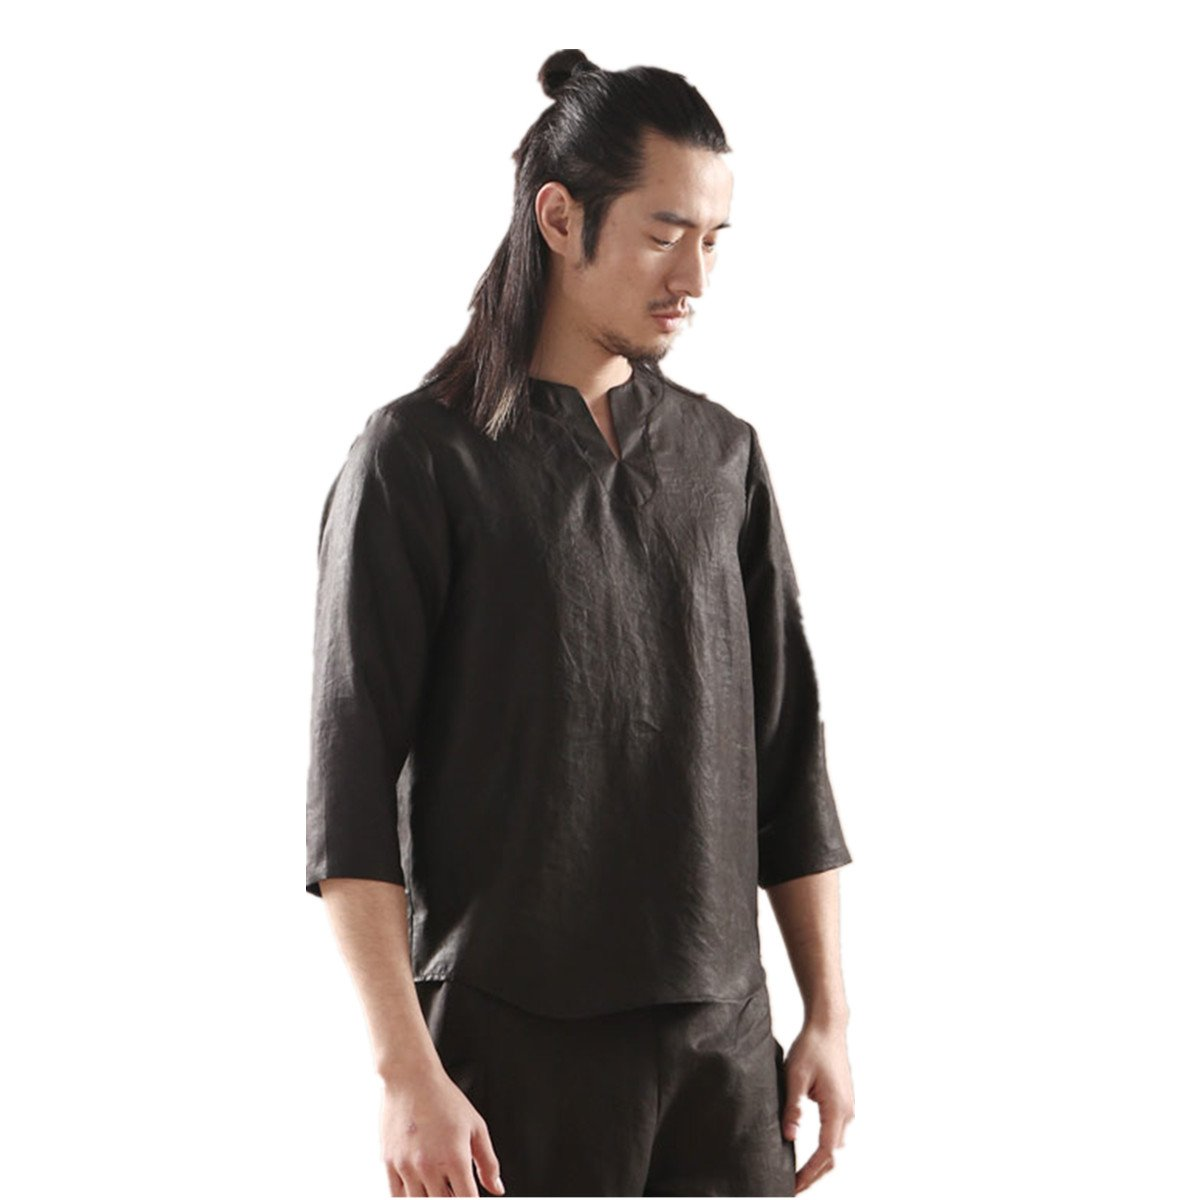 WEISAN Mens Keroa Traditional Mulberry Silk Shirts Buddha Costume Short Sleeve